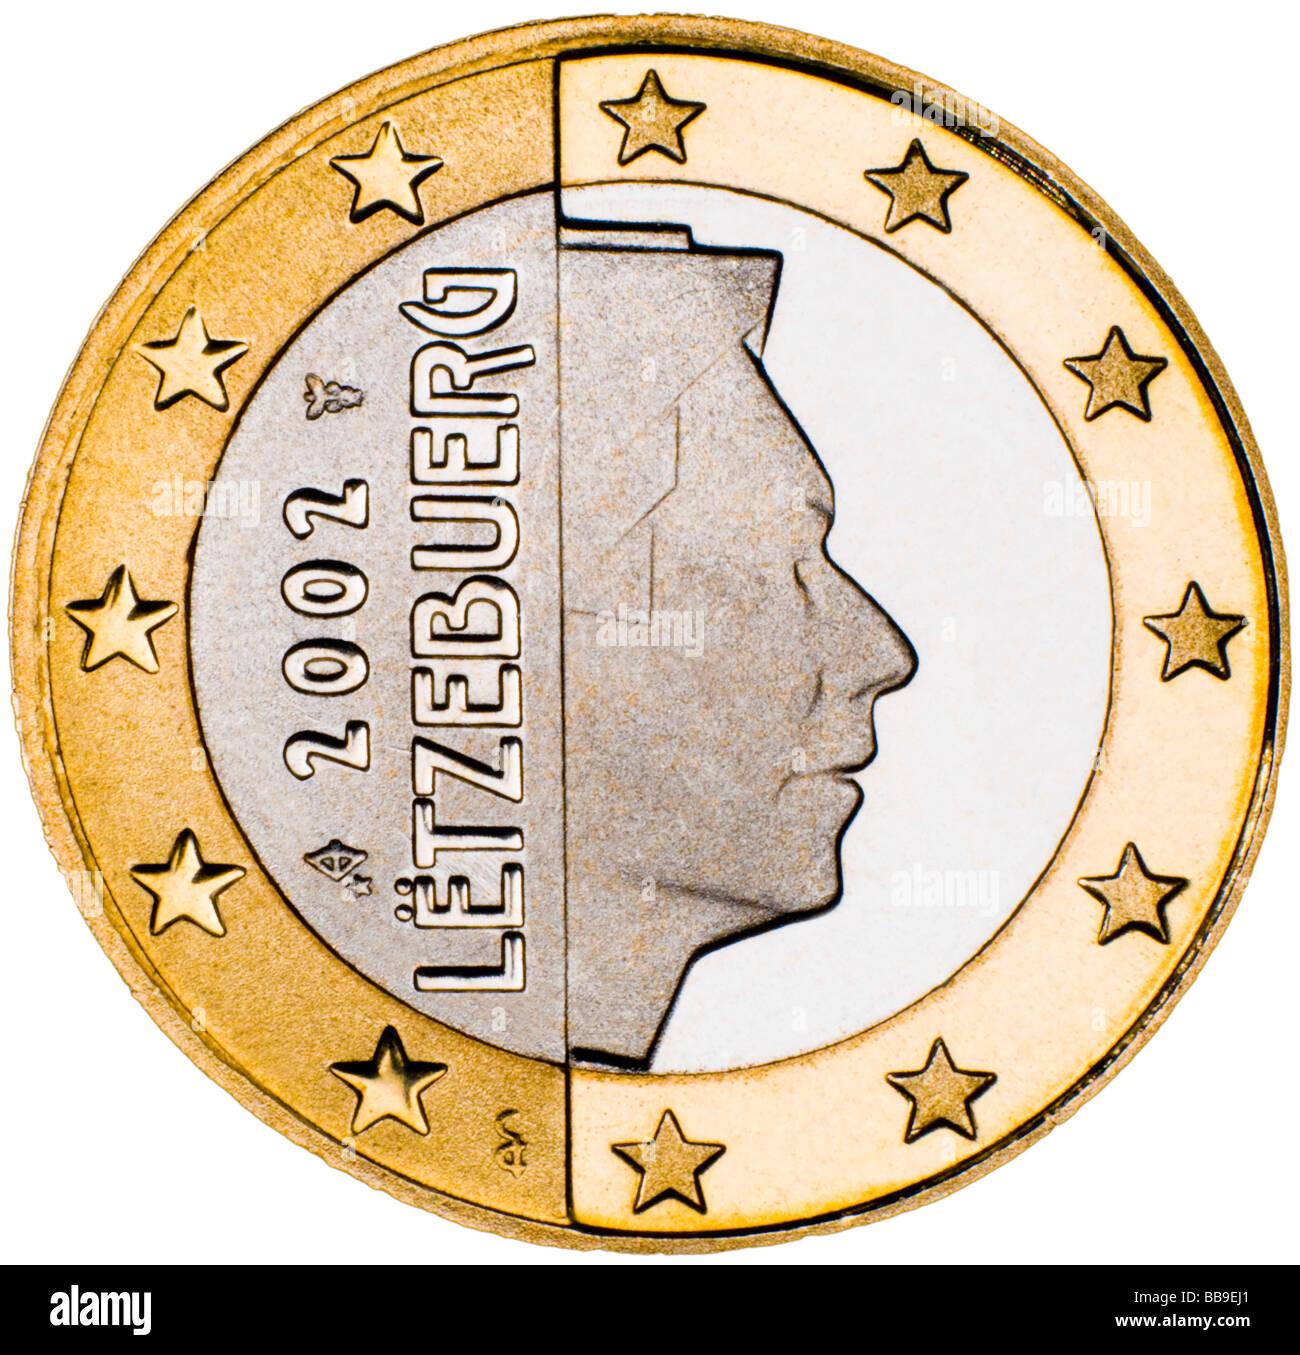 Luxemburg 1-Euro-Münze Rückseite Stockbild